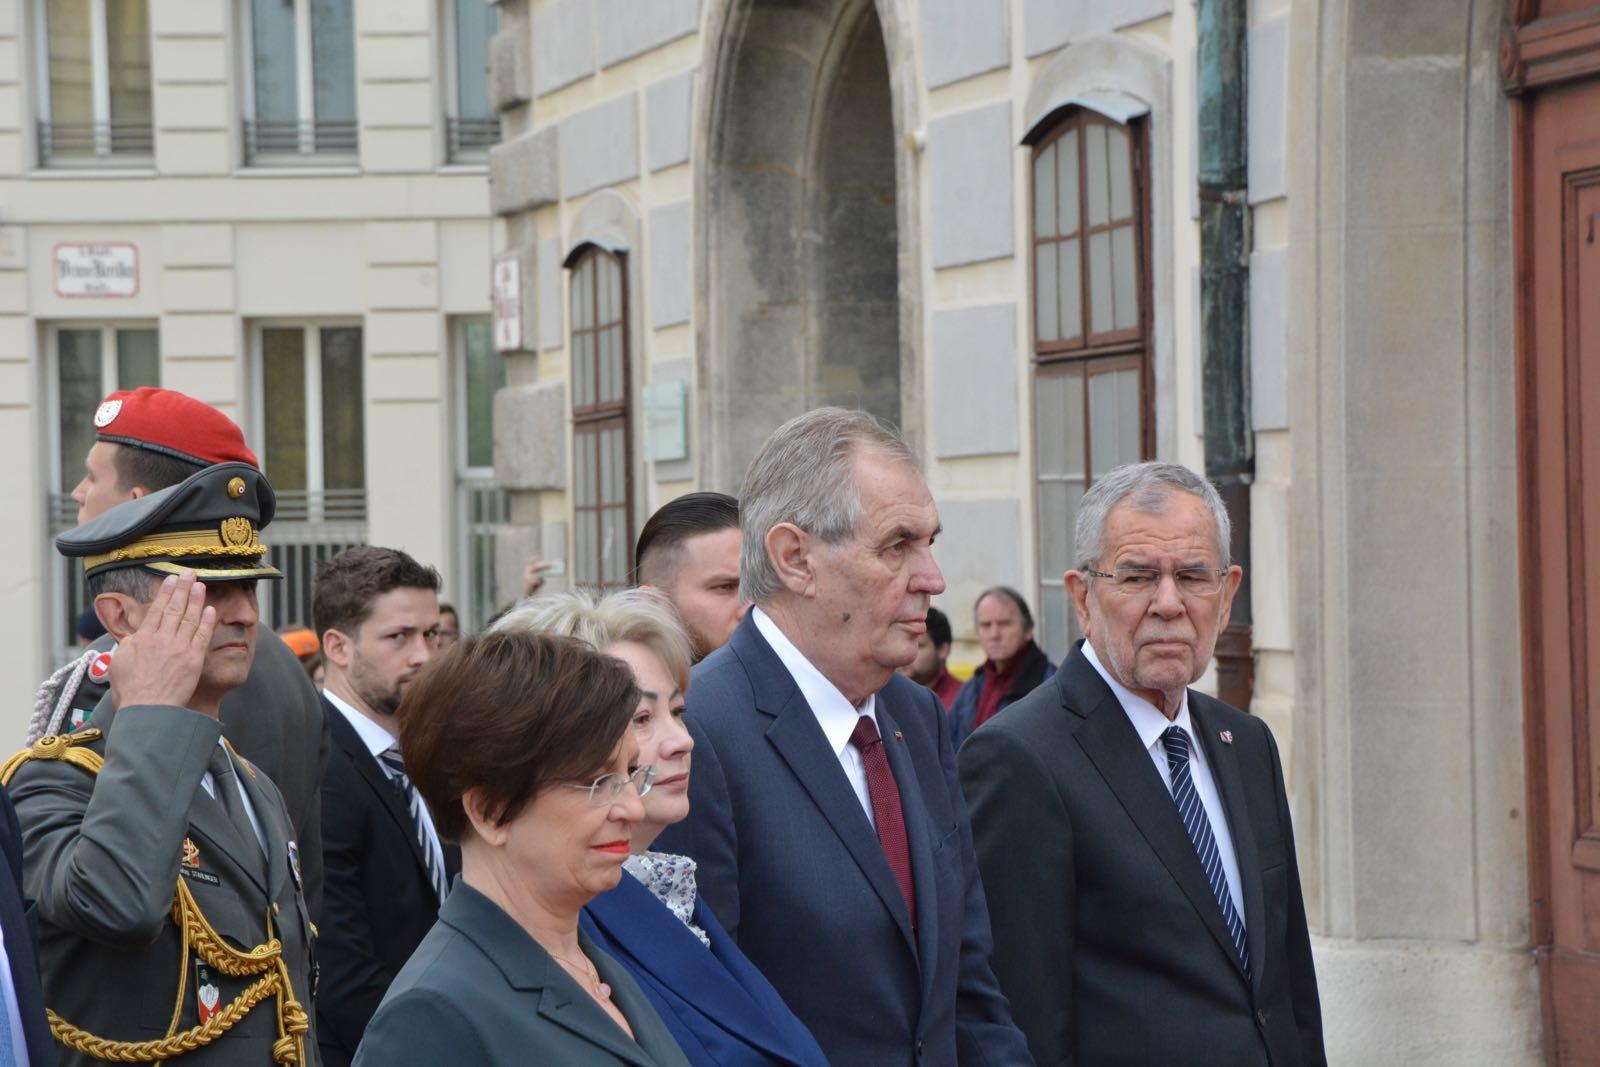 2019_04_03_4Gardekompanie_Tschechien_VdB - 21 of 46